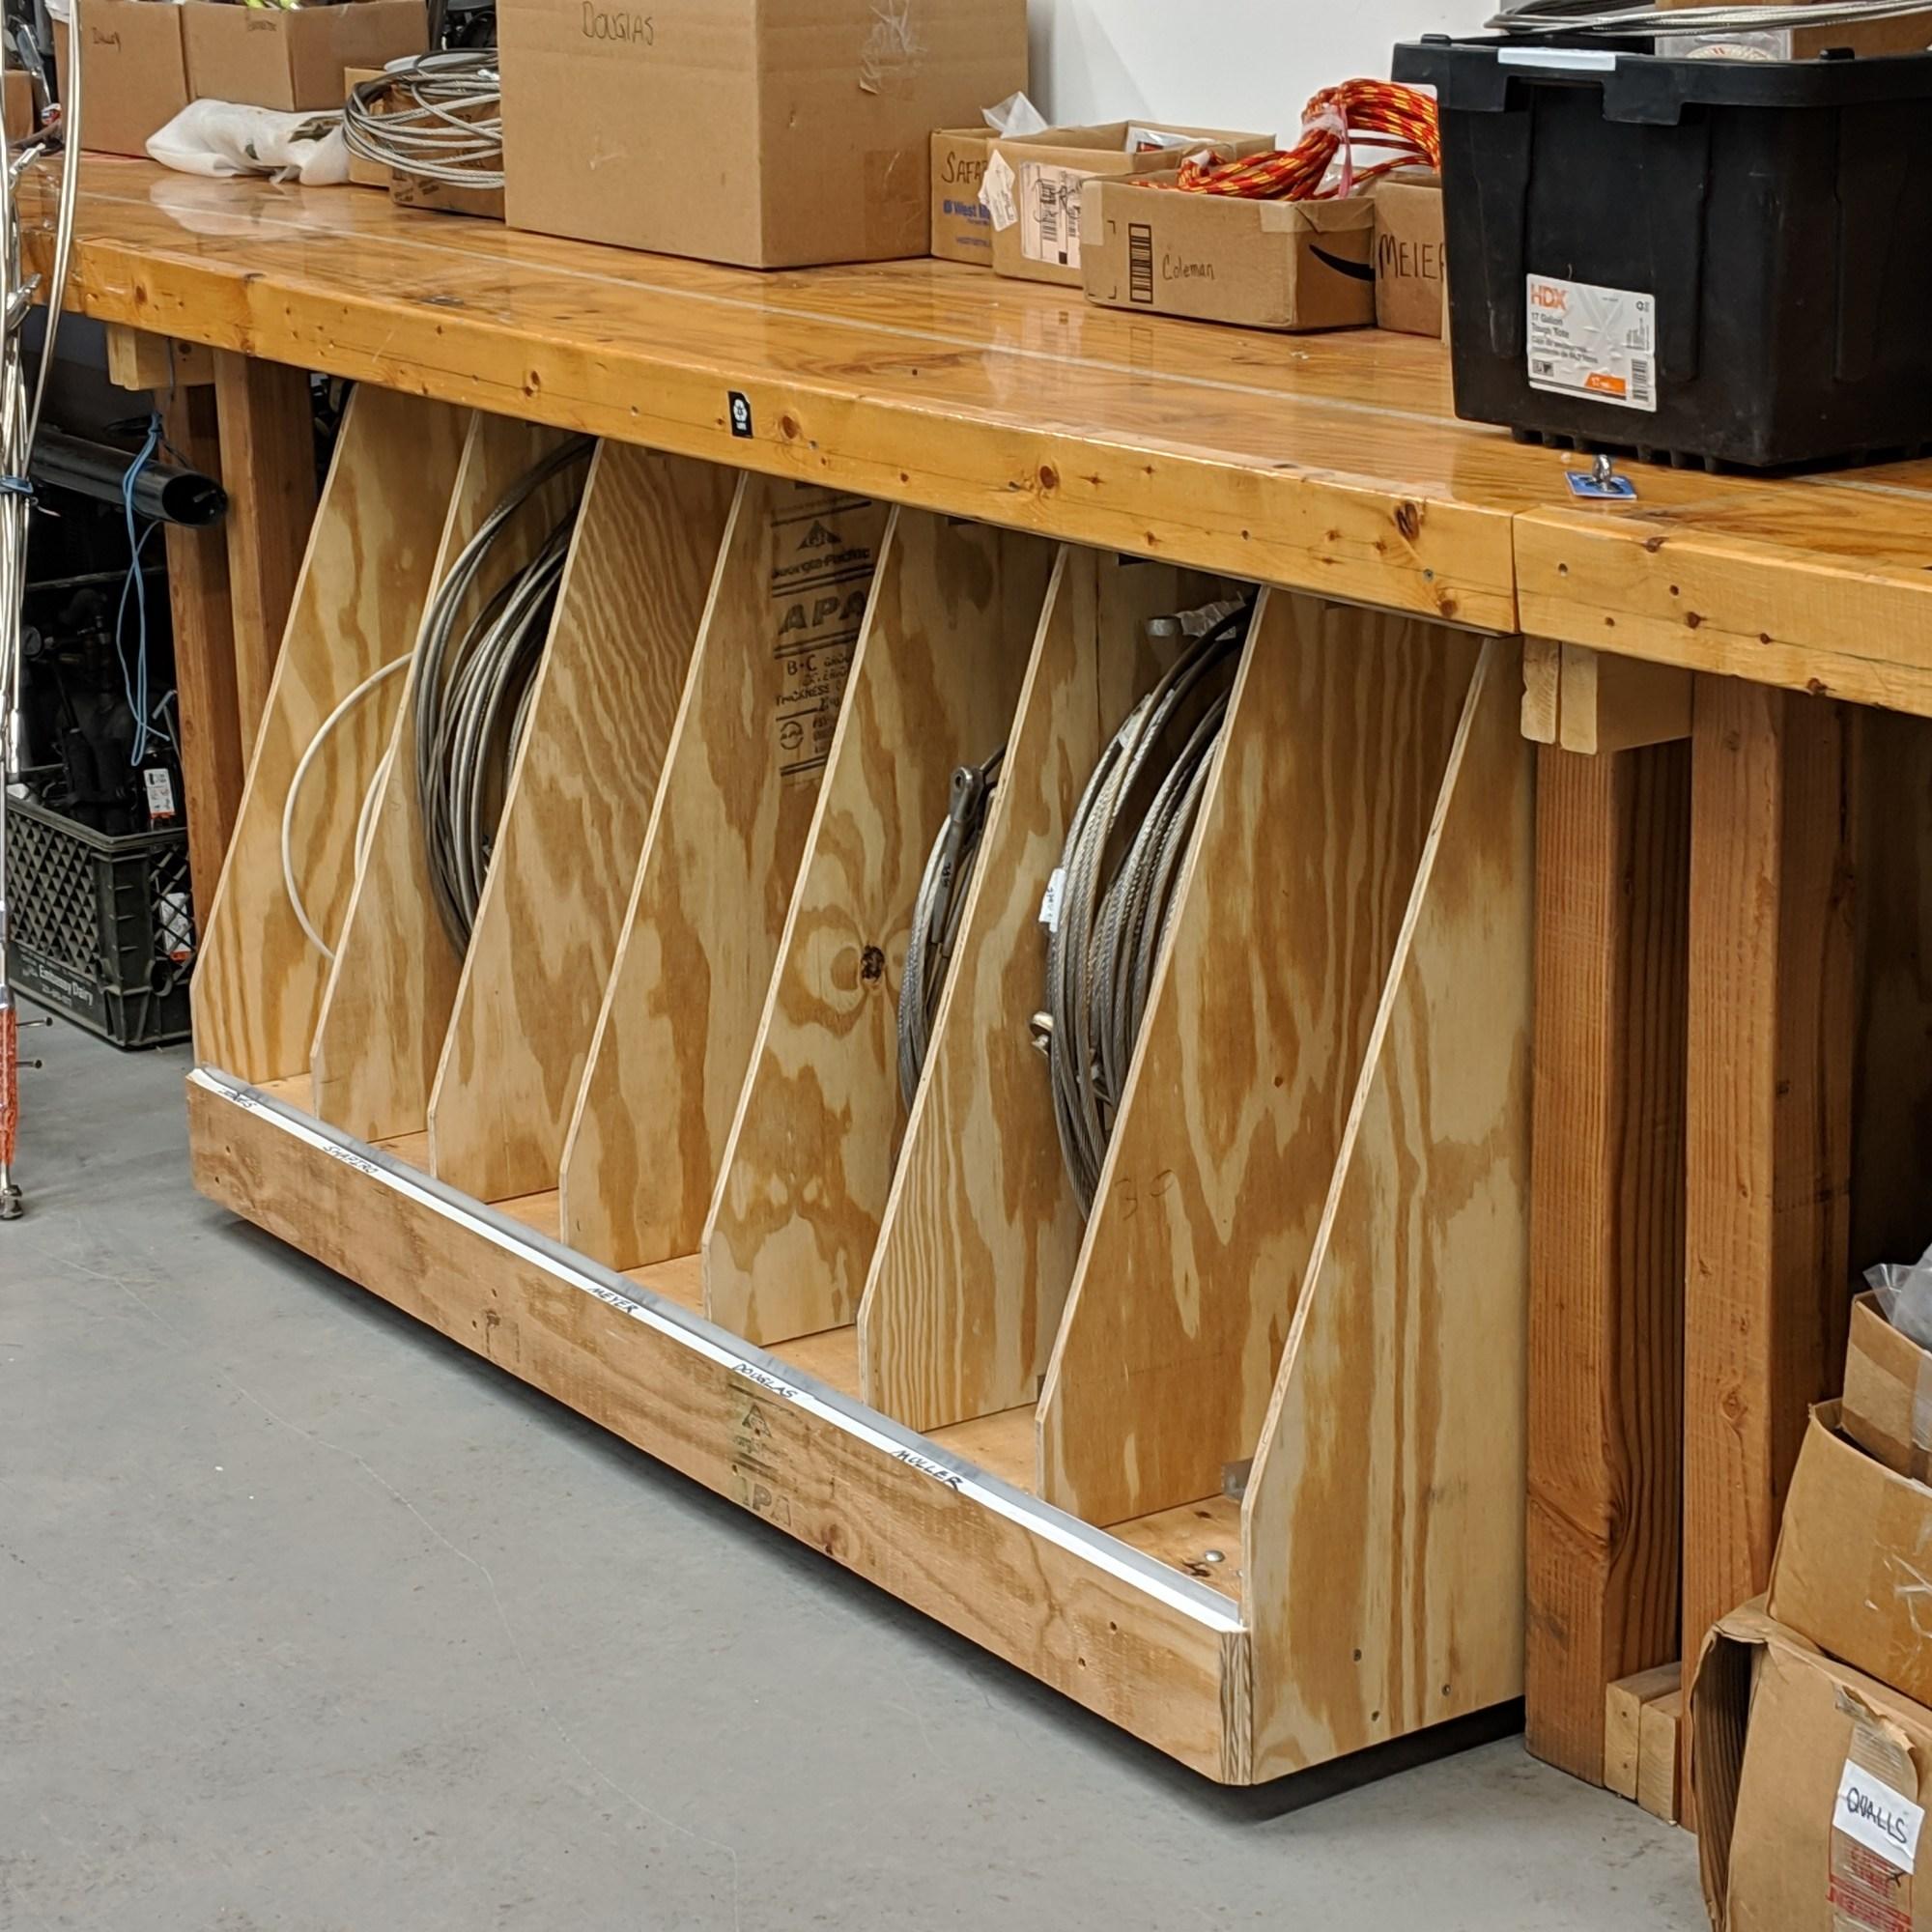 New rolling wire rigging storage box. The rigging company.